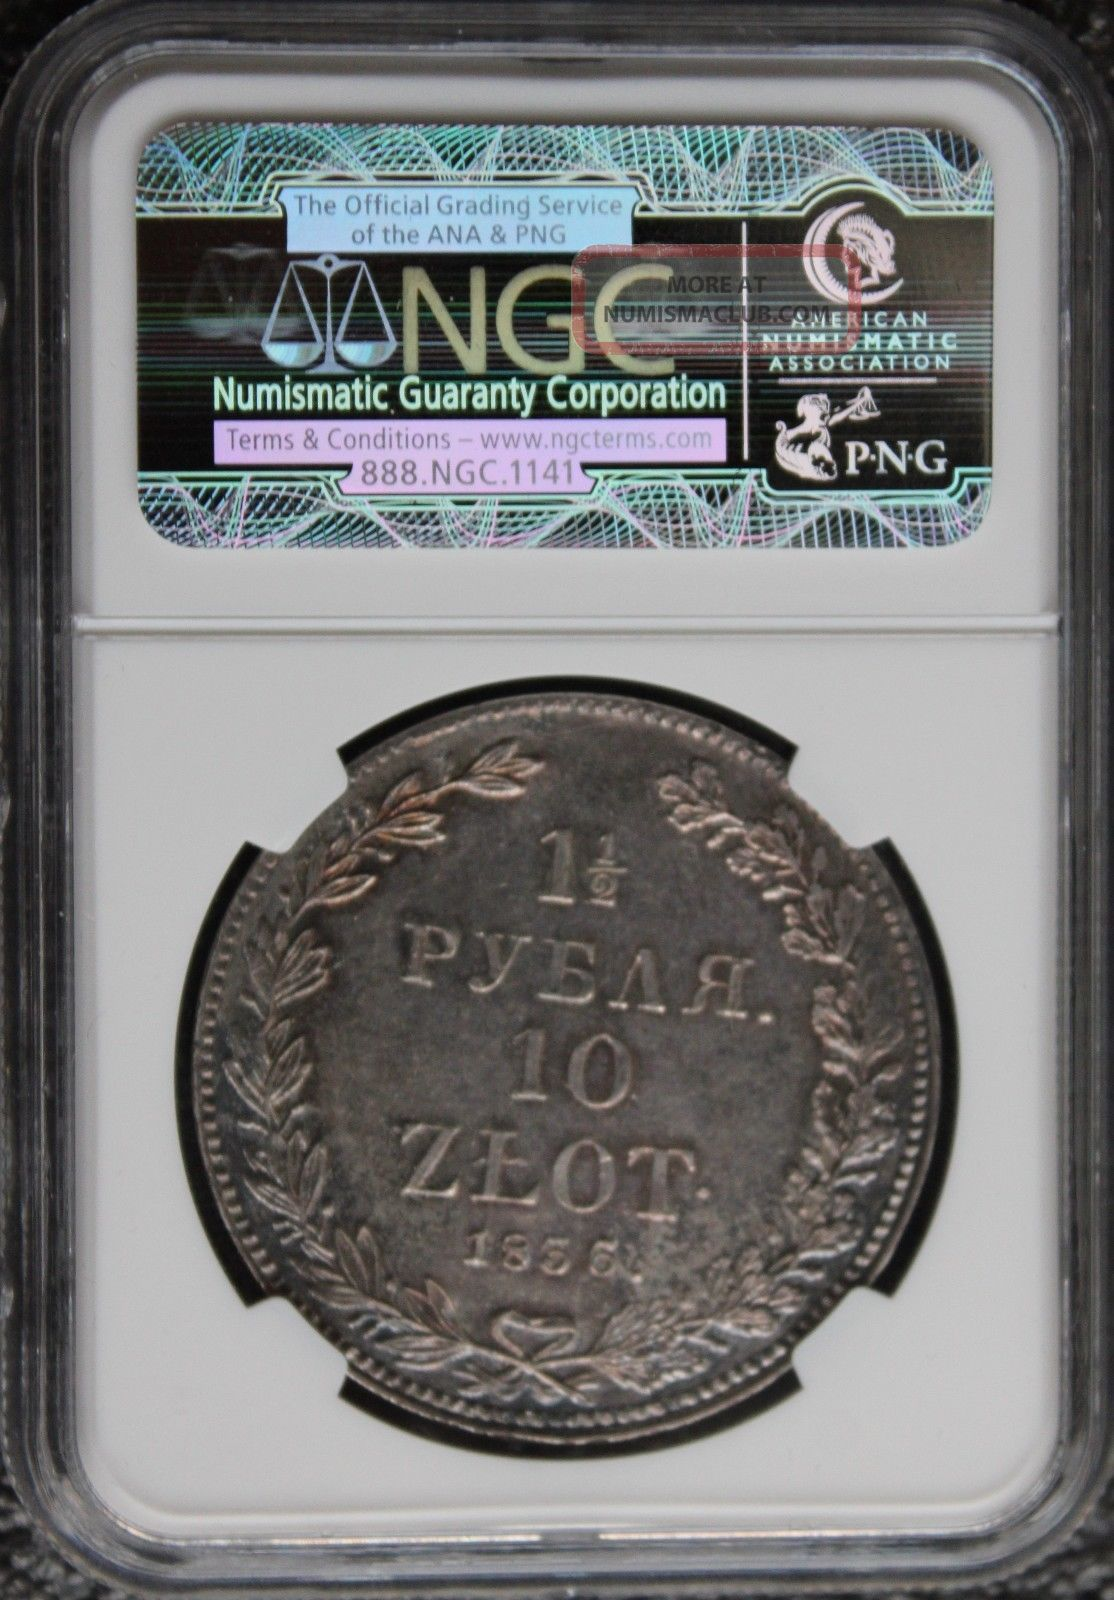 Russia 1 1/2 Rouble/10zlotych 1836ht Ngc Ms61 Nykolay I Extra Rare Coin Russia photo